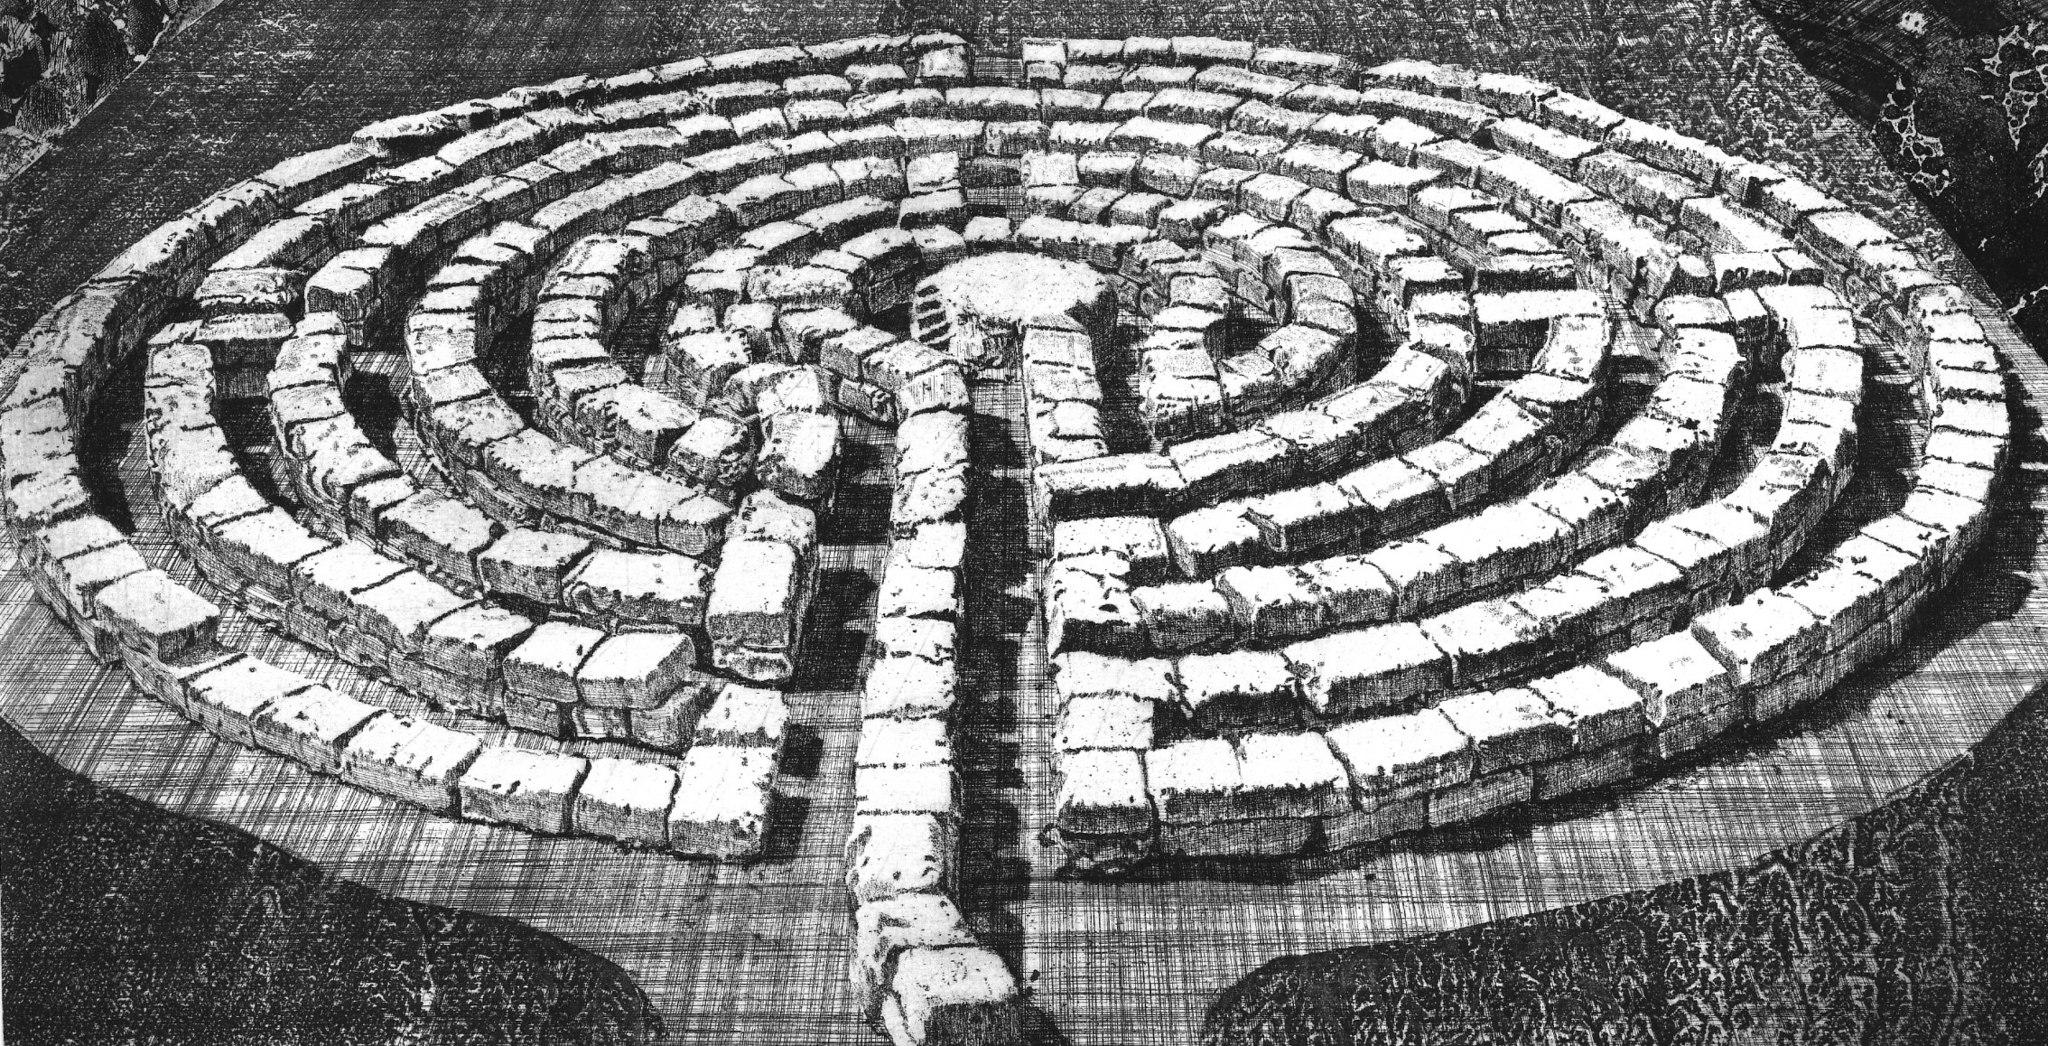 2048px-Labyrinth_28.jpg